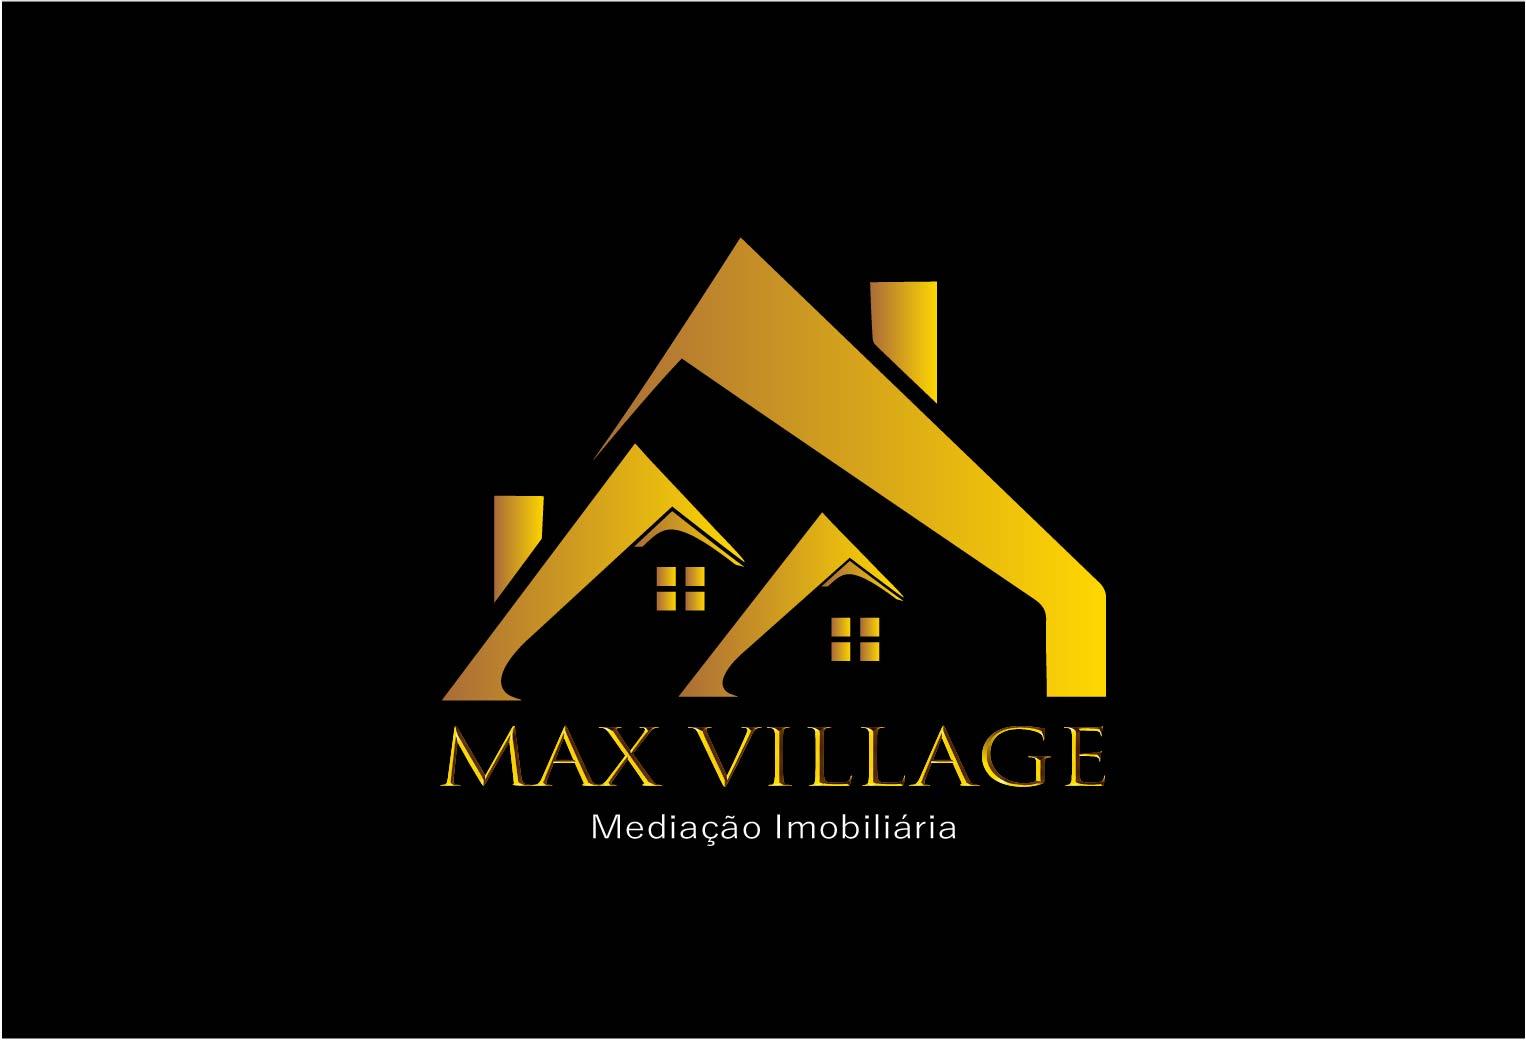 Max Village